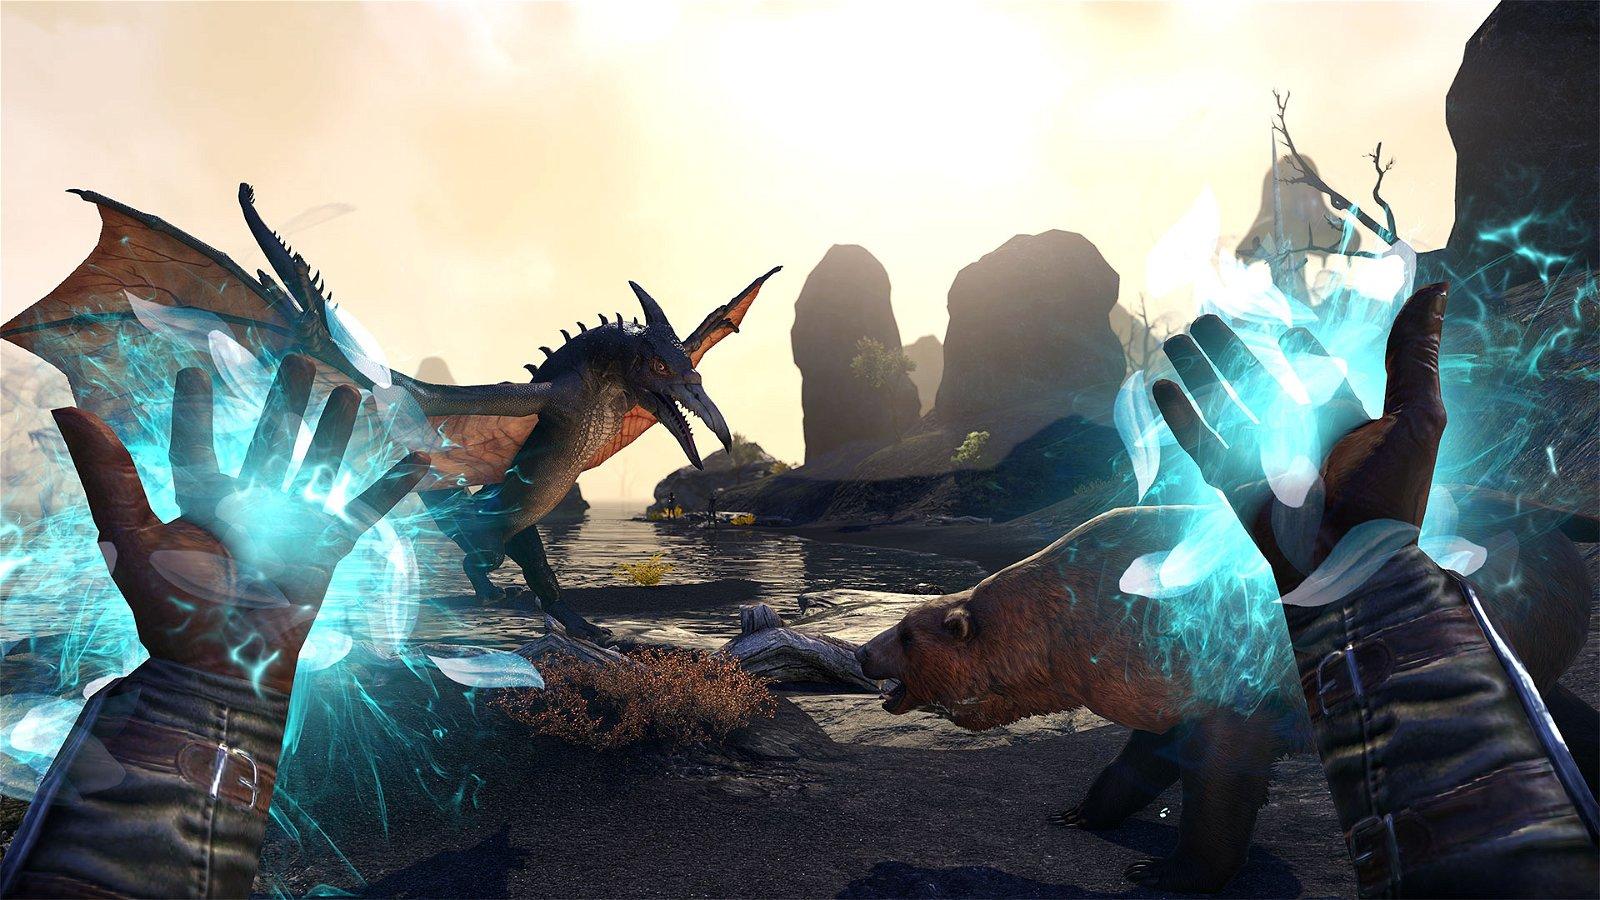 Elder Scrolls Online: Morrowind Review - Going Back In Time 5